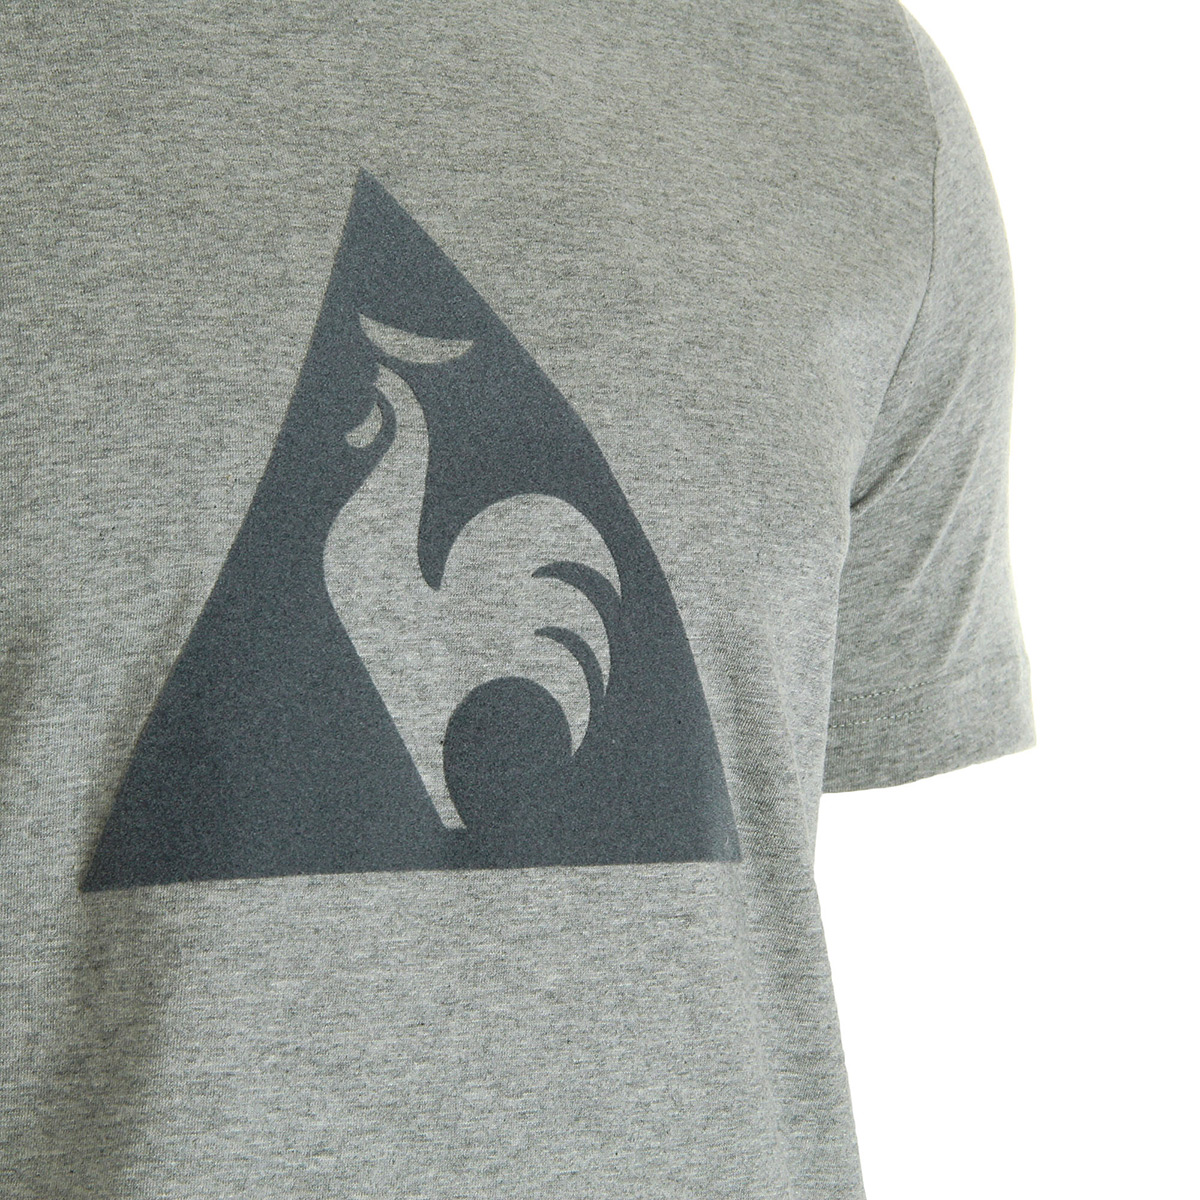 Vêtement T-Shirts Le Coq Sportif homme Ess N°1 Tee Grey taille Gris ... cafbc25dd48